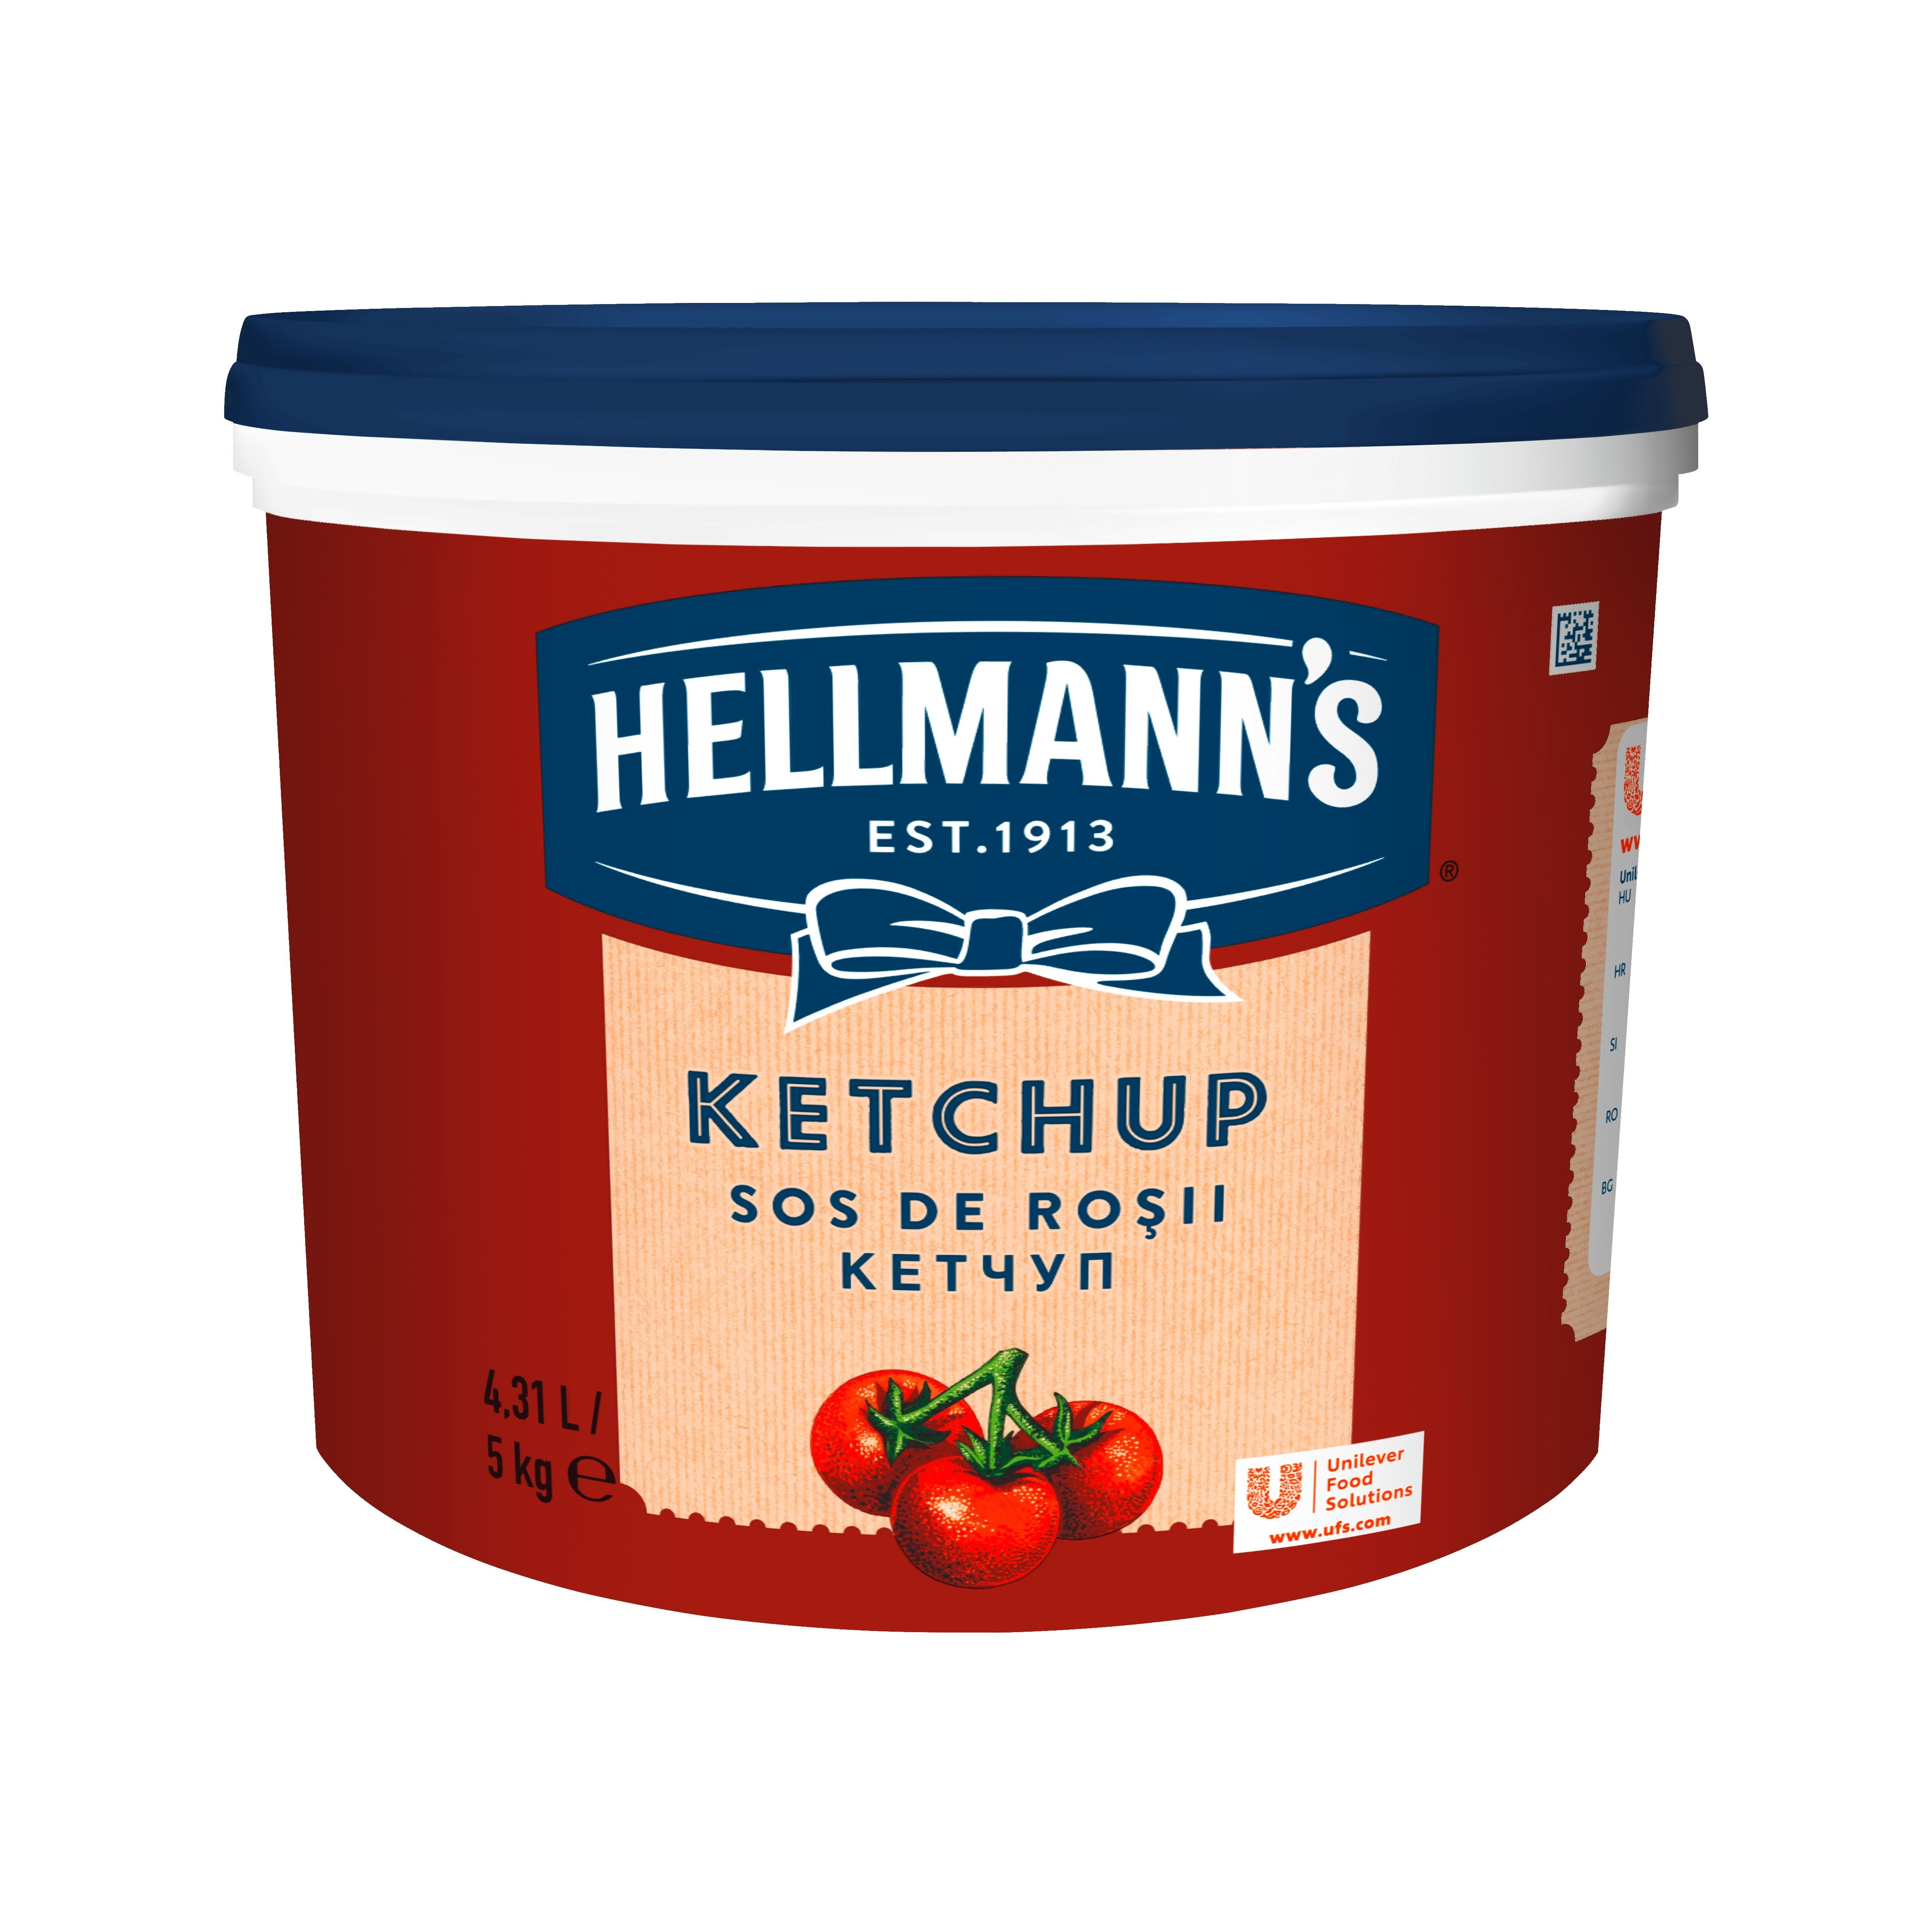 HELLMANN'S Ketchup vödrös 5 kg -